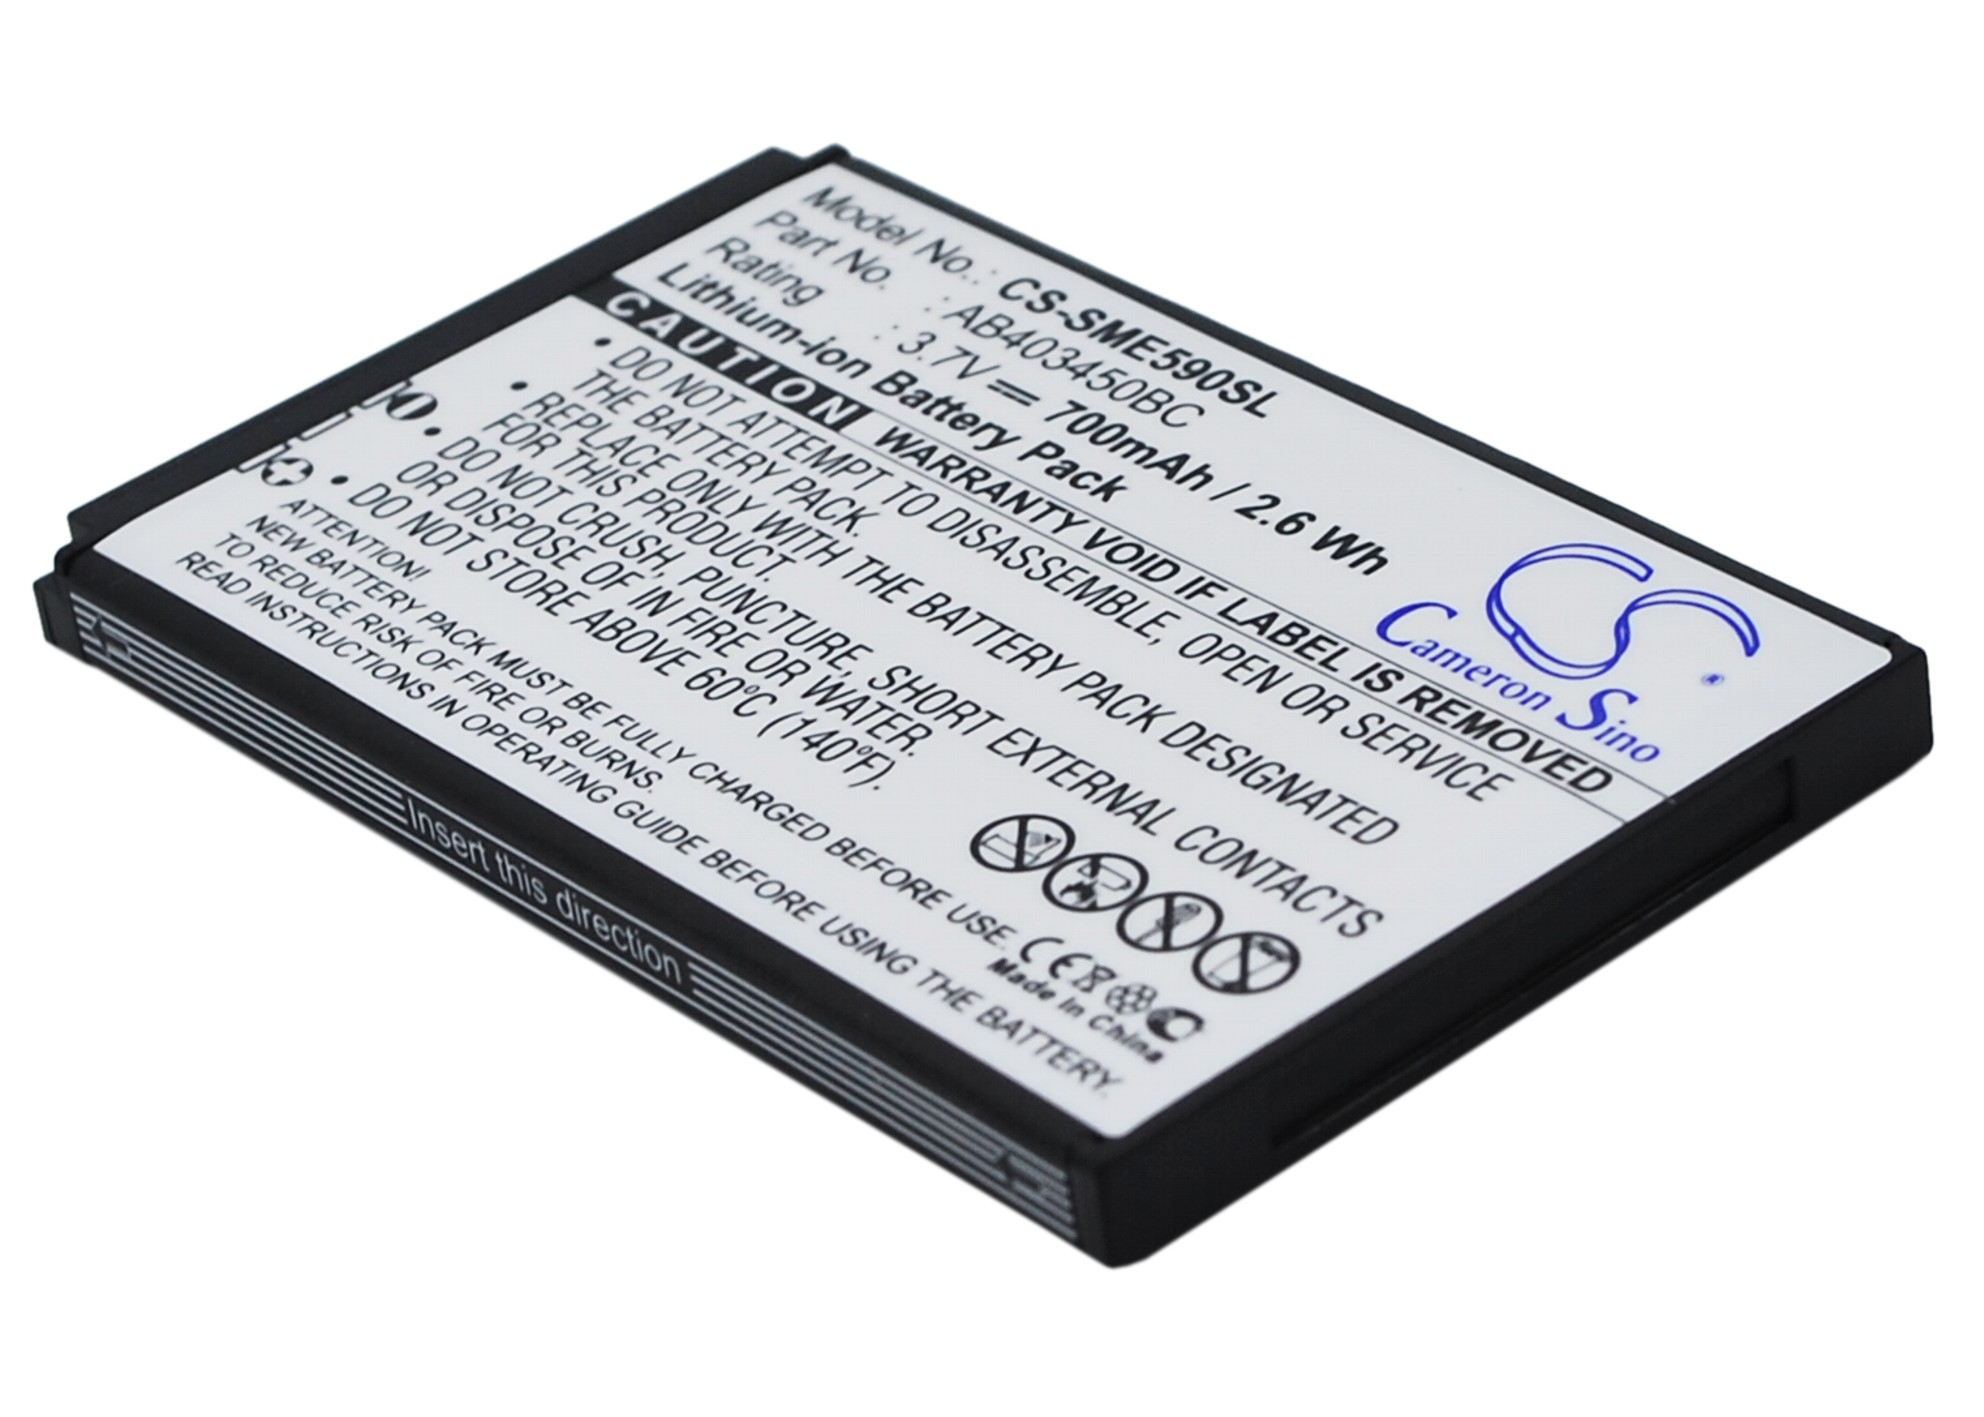 Cameron Sino baterie do mobilů pro SAMSUNG SGH-L310 3.7V Li-ion 700mAh černá - neoriginální